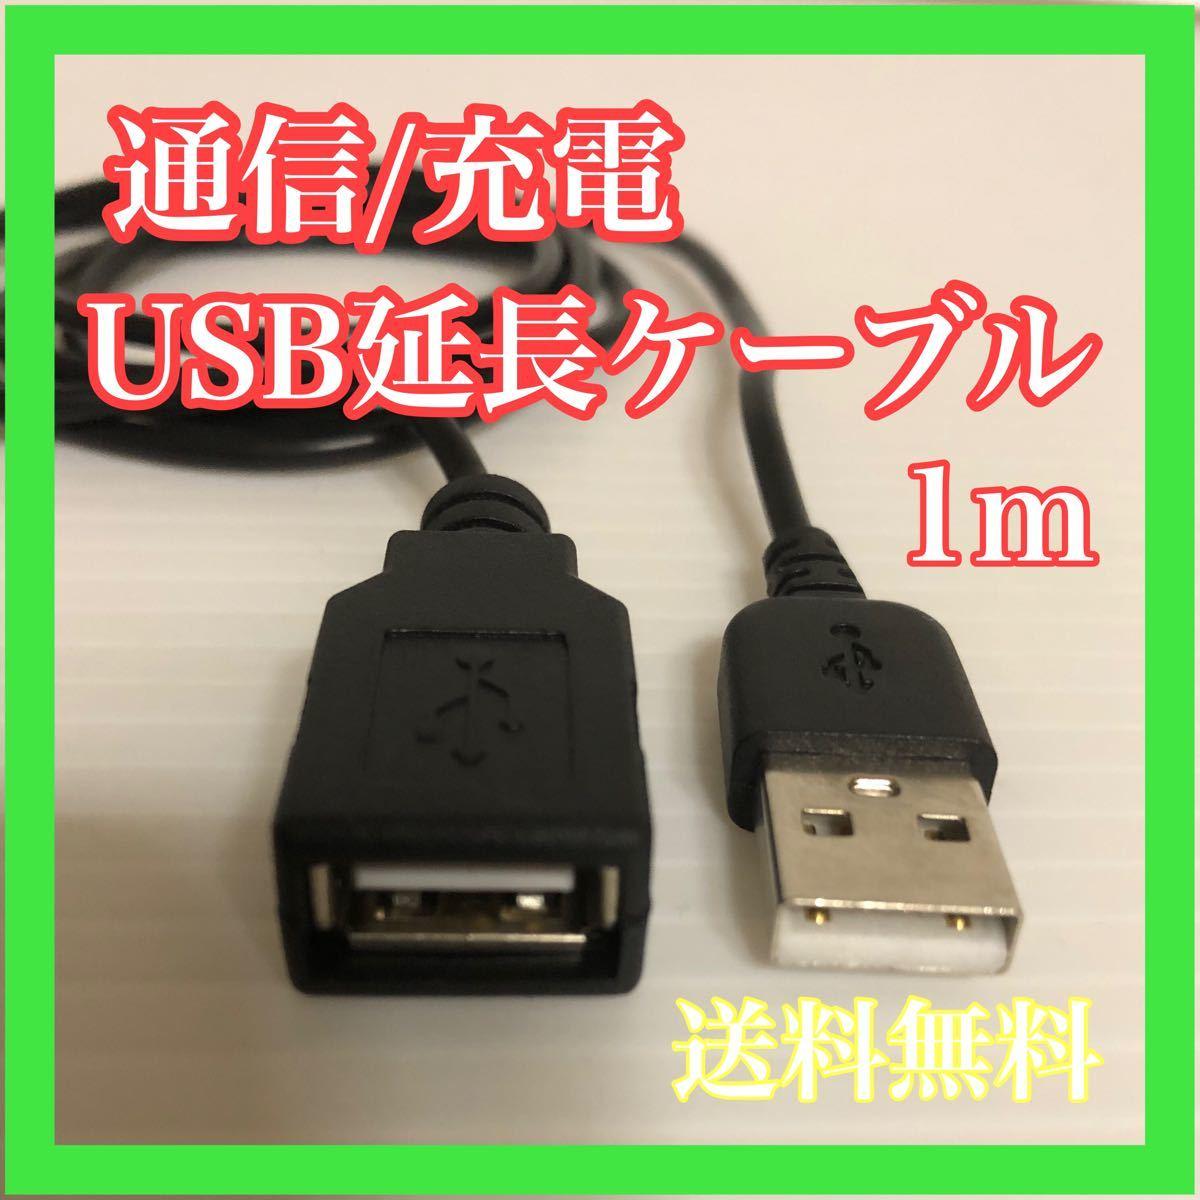 USB延長ケーブル 長さ1.0m  即購入 OK!